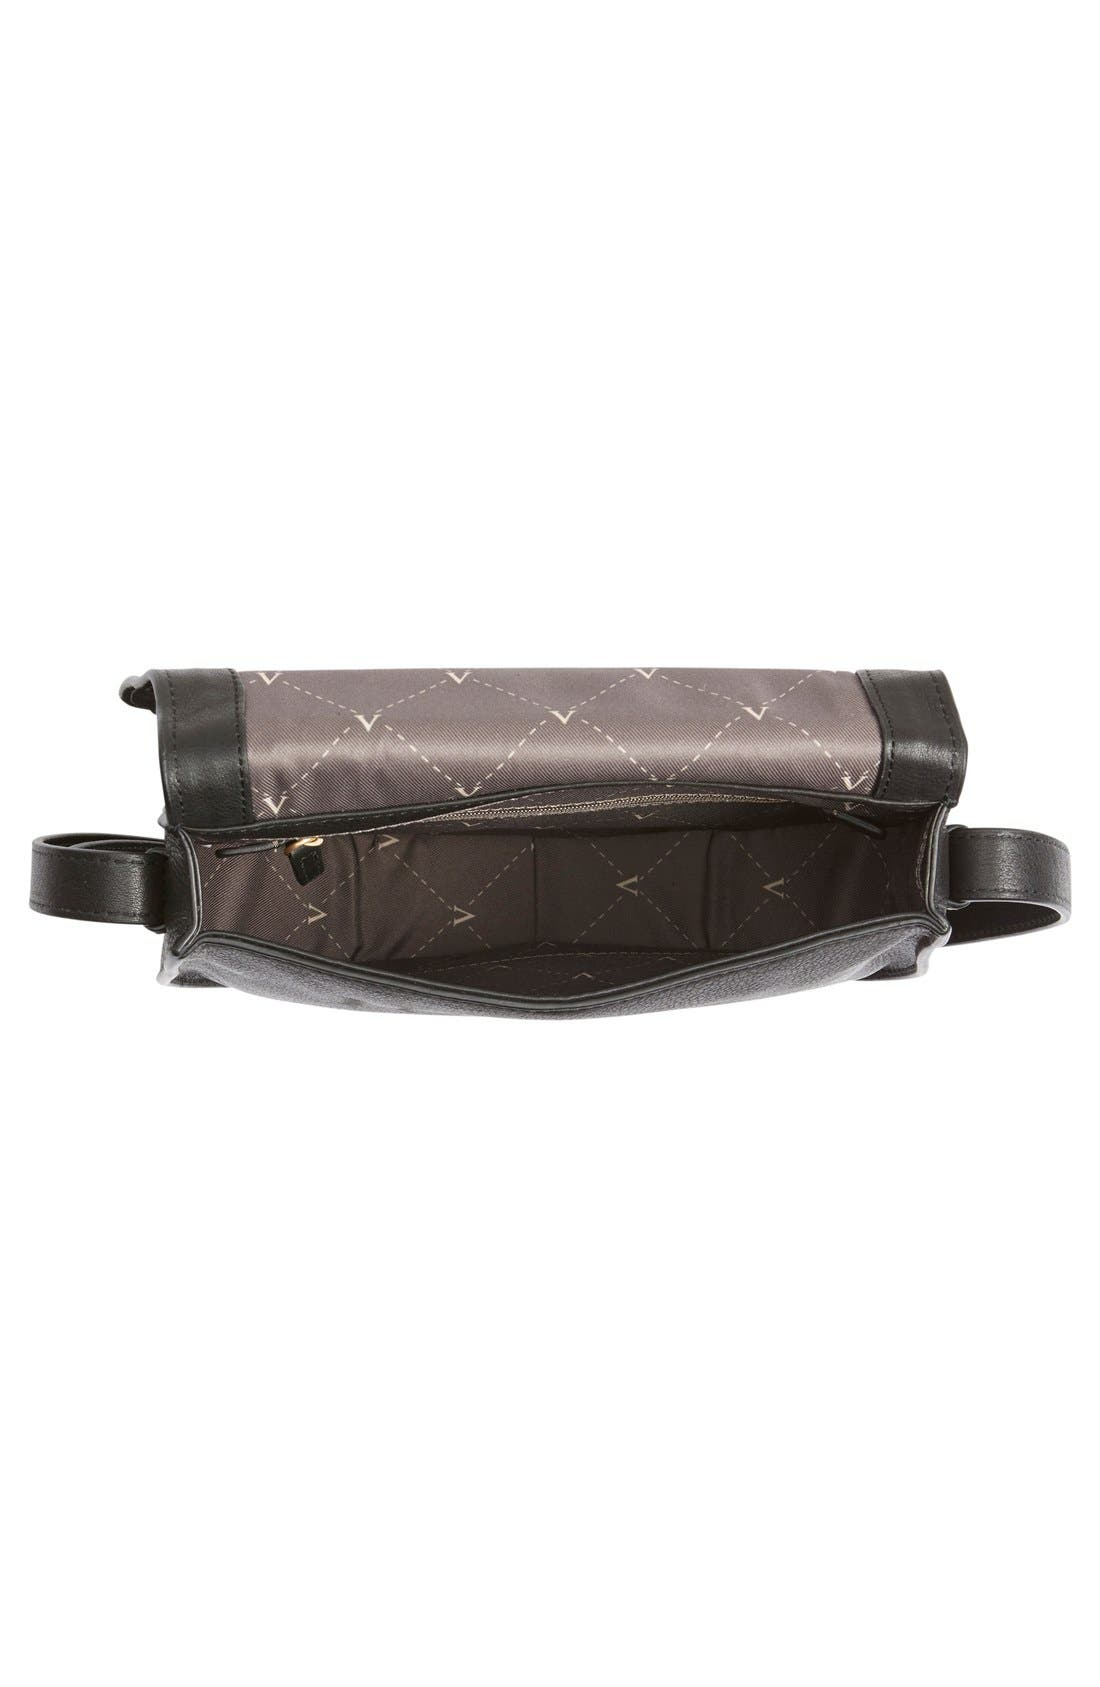 VINCE CAMUTO, 'Izzi' Tassel Leather & Suede Crossbody Bag, Alternate thumbnail 4, color, 001